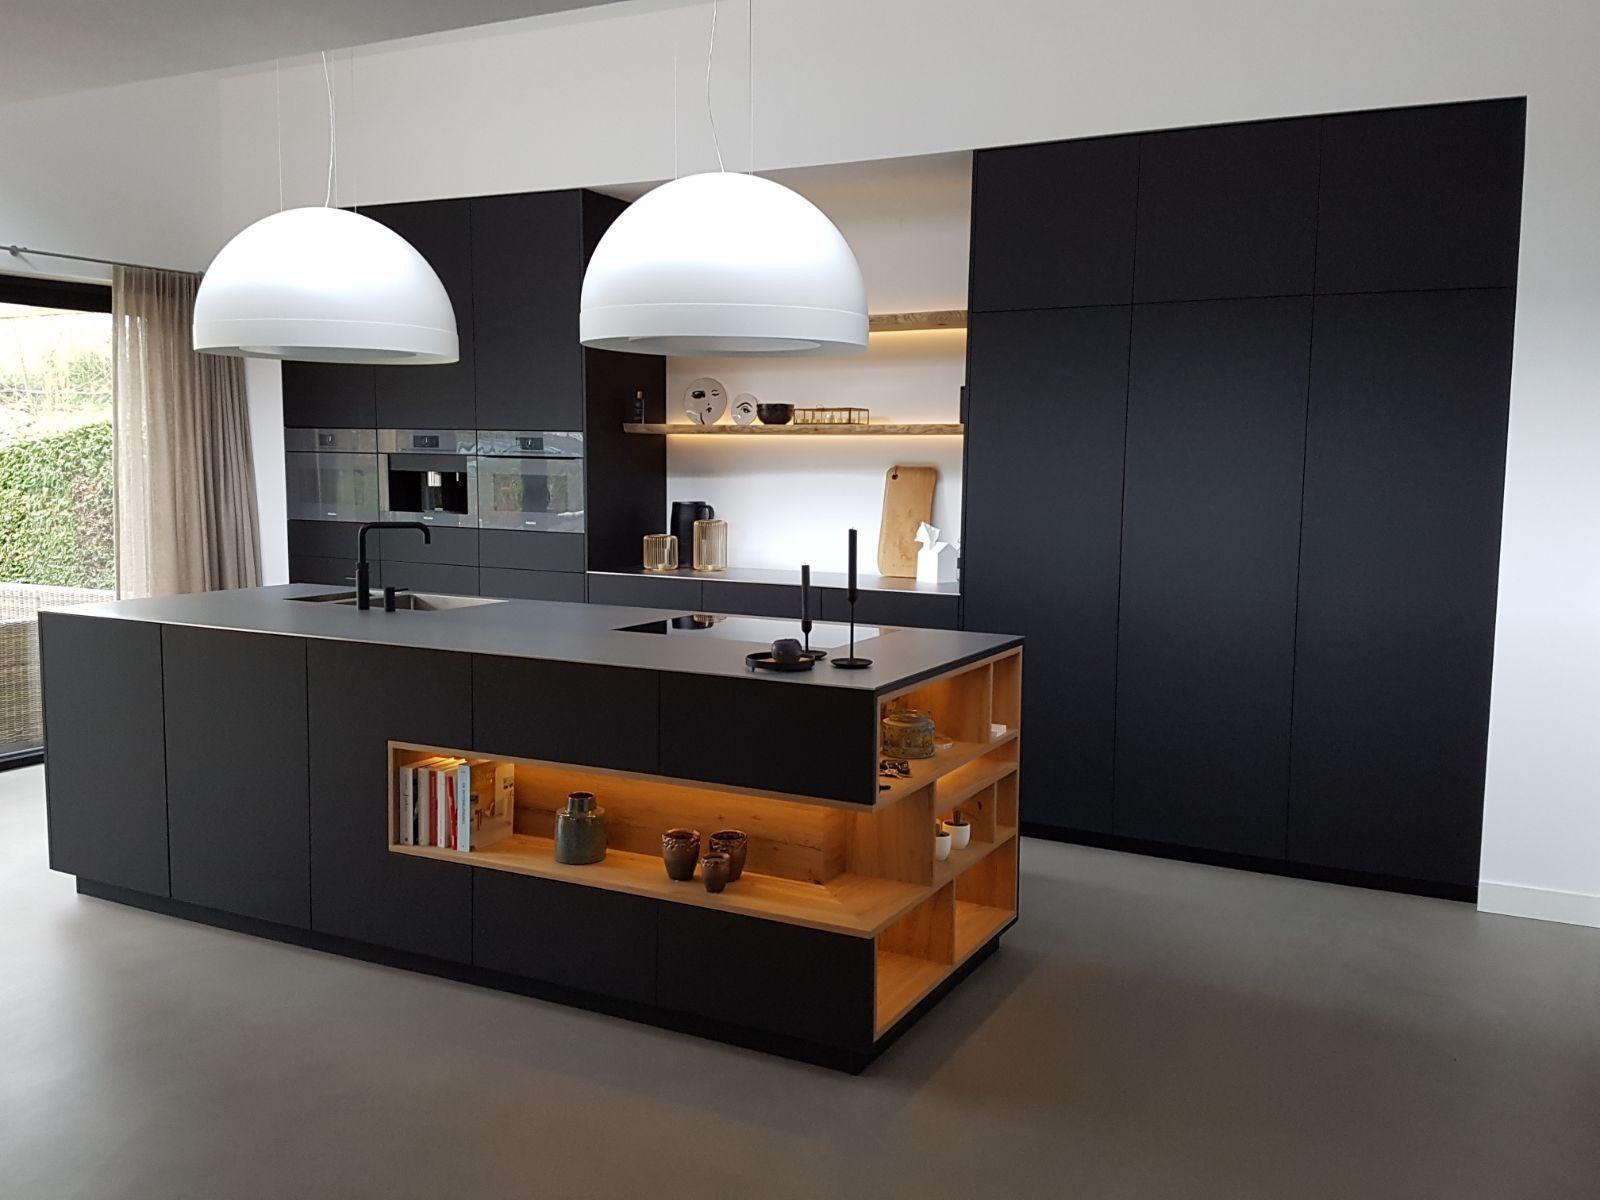 Black kitchen (Vos71) | mutfak modelleri en 2019 | Cuisine ...